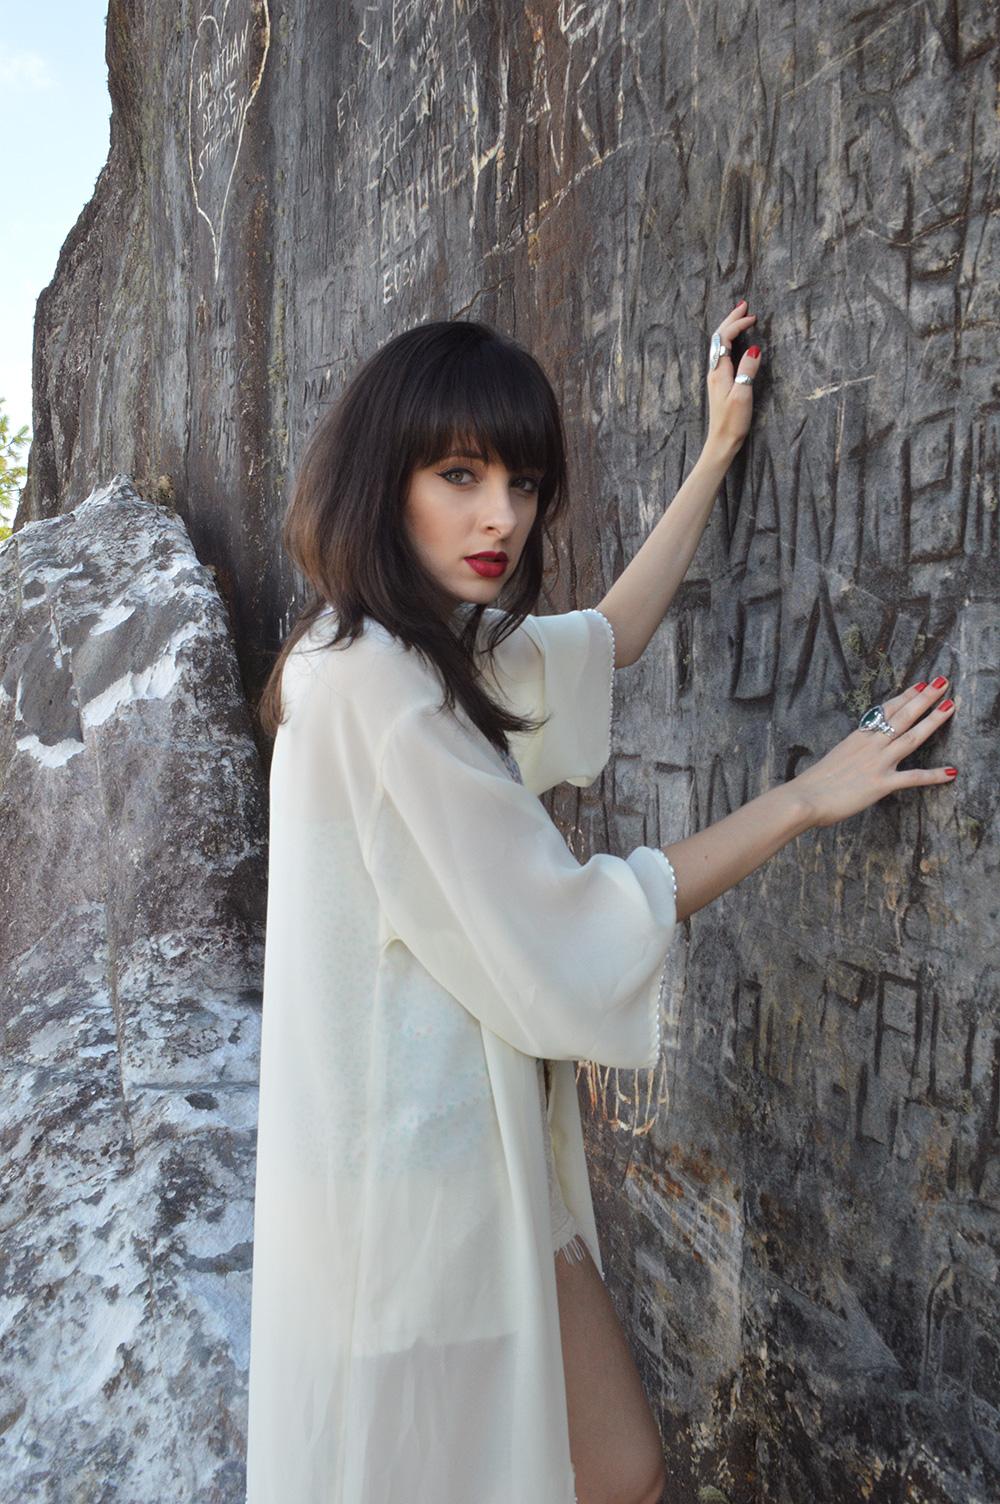 look-queen-of-peace-blog-ela-inspira-7